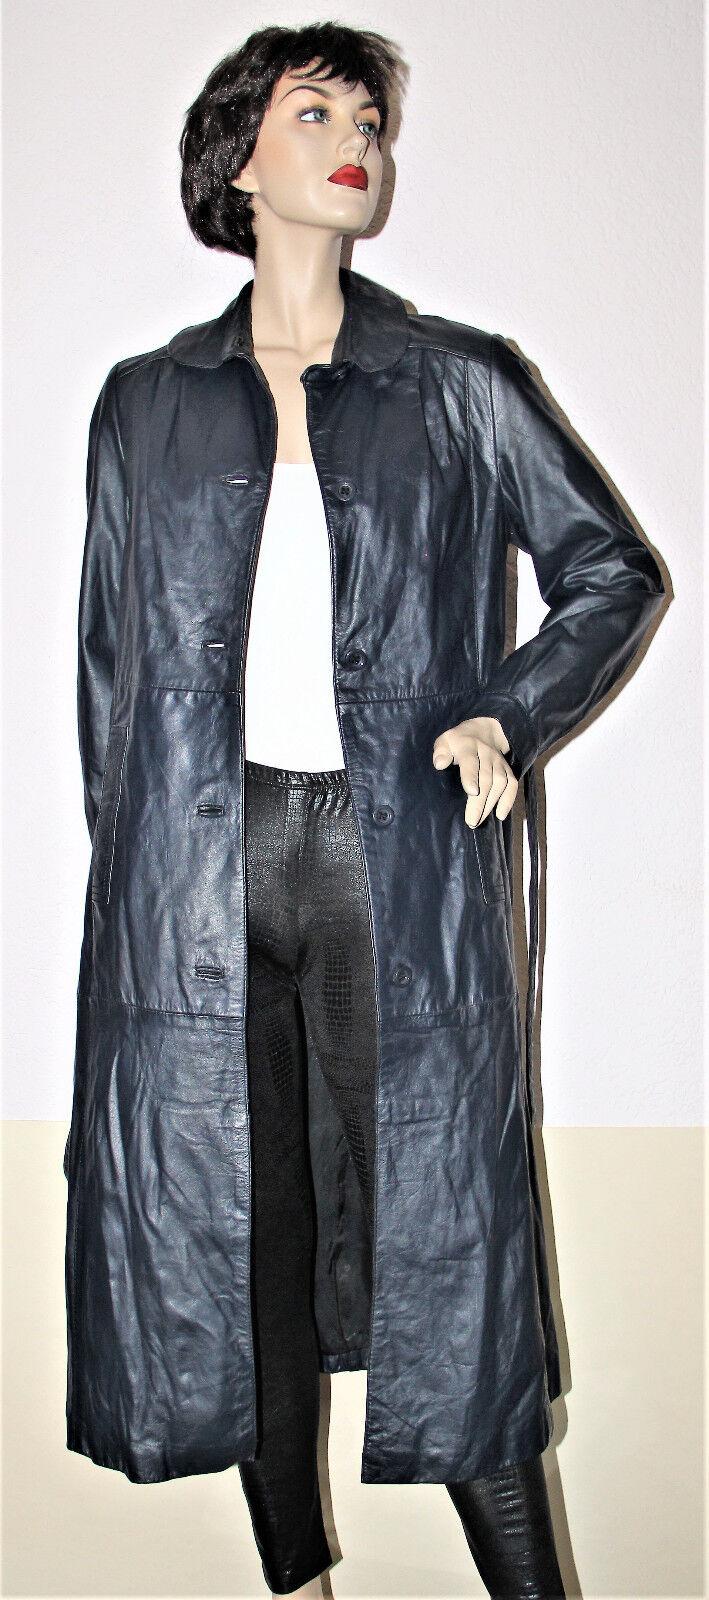 116cm schöner Damen Ledermantel sehr weiches Echtleder blau Gr. Gr. Gr. s. Maße 4b4214